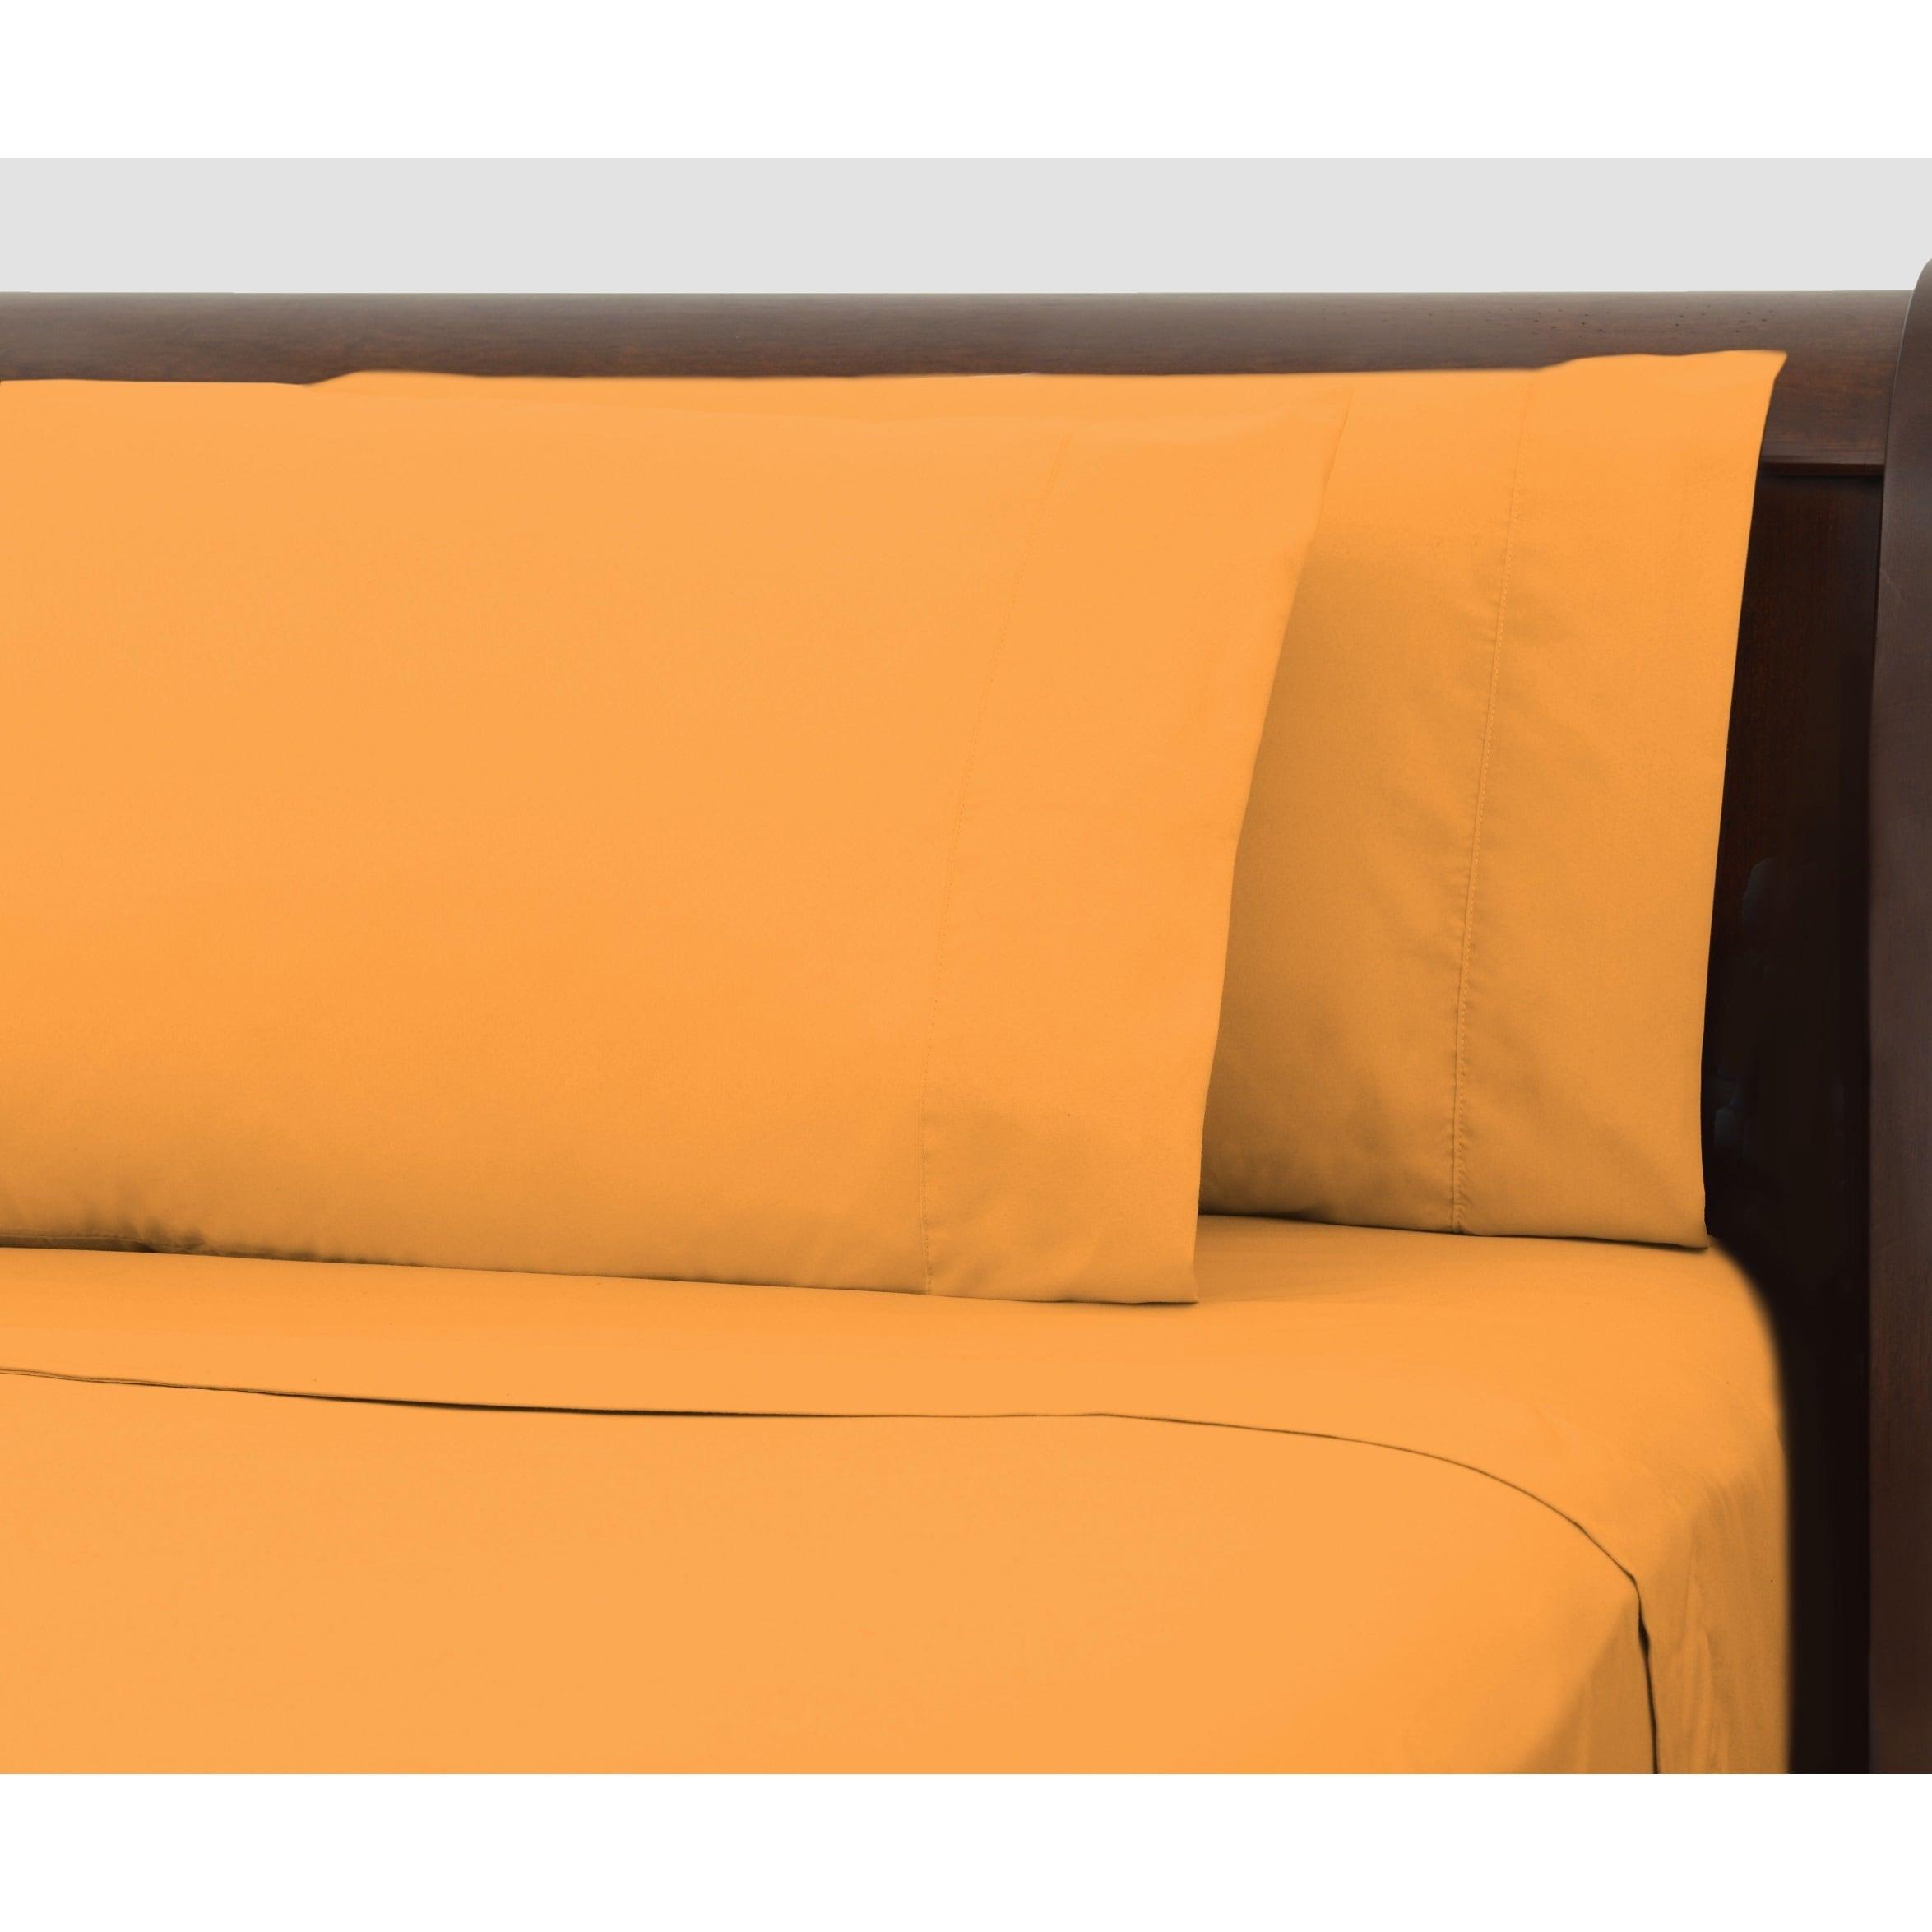 Bright Ideas Tangerine Wrinkle Resistant Sheet Set Overstock 9164691